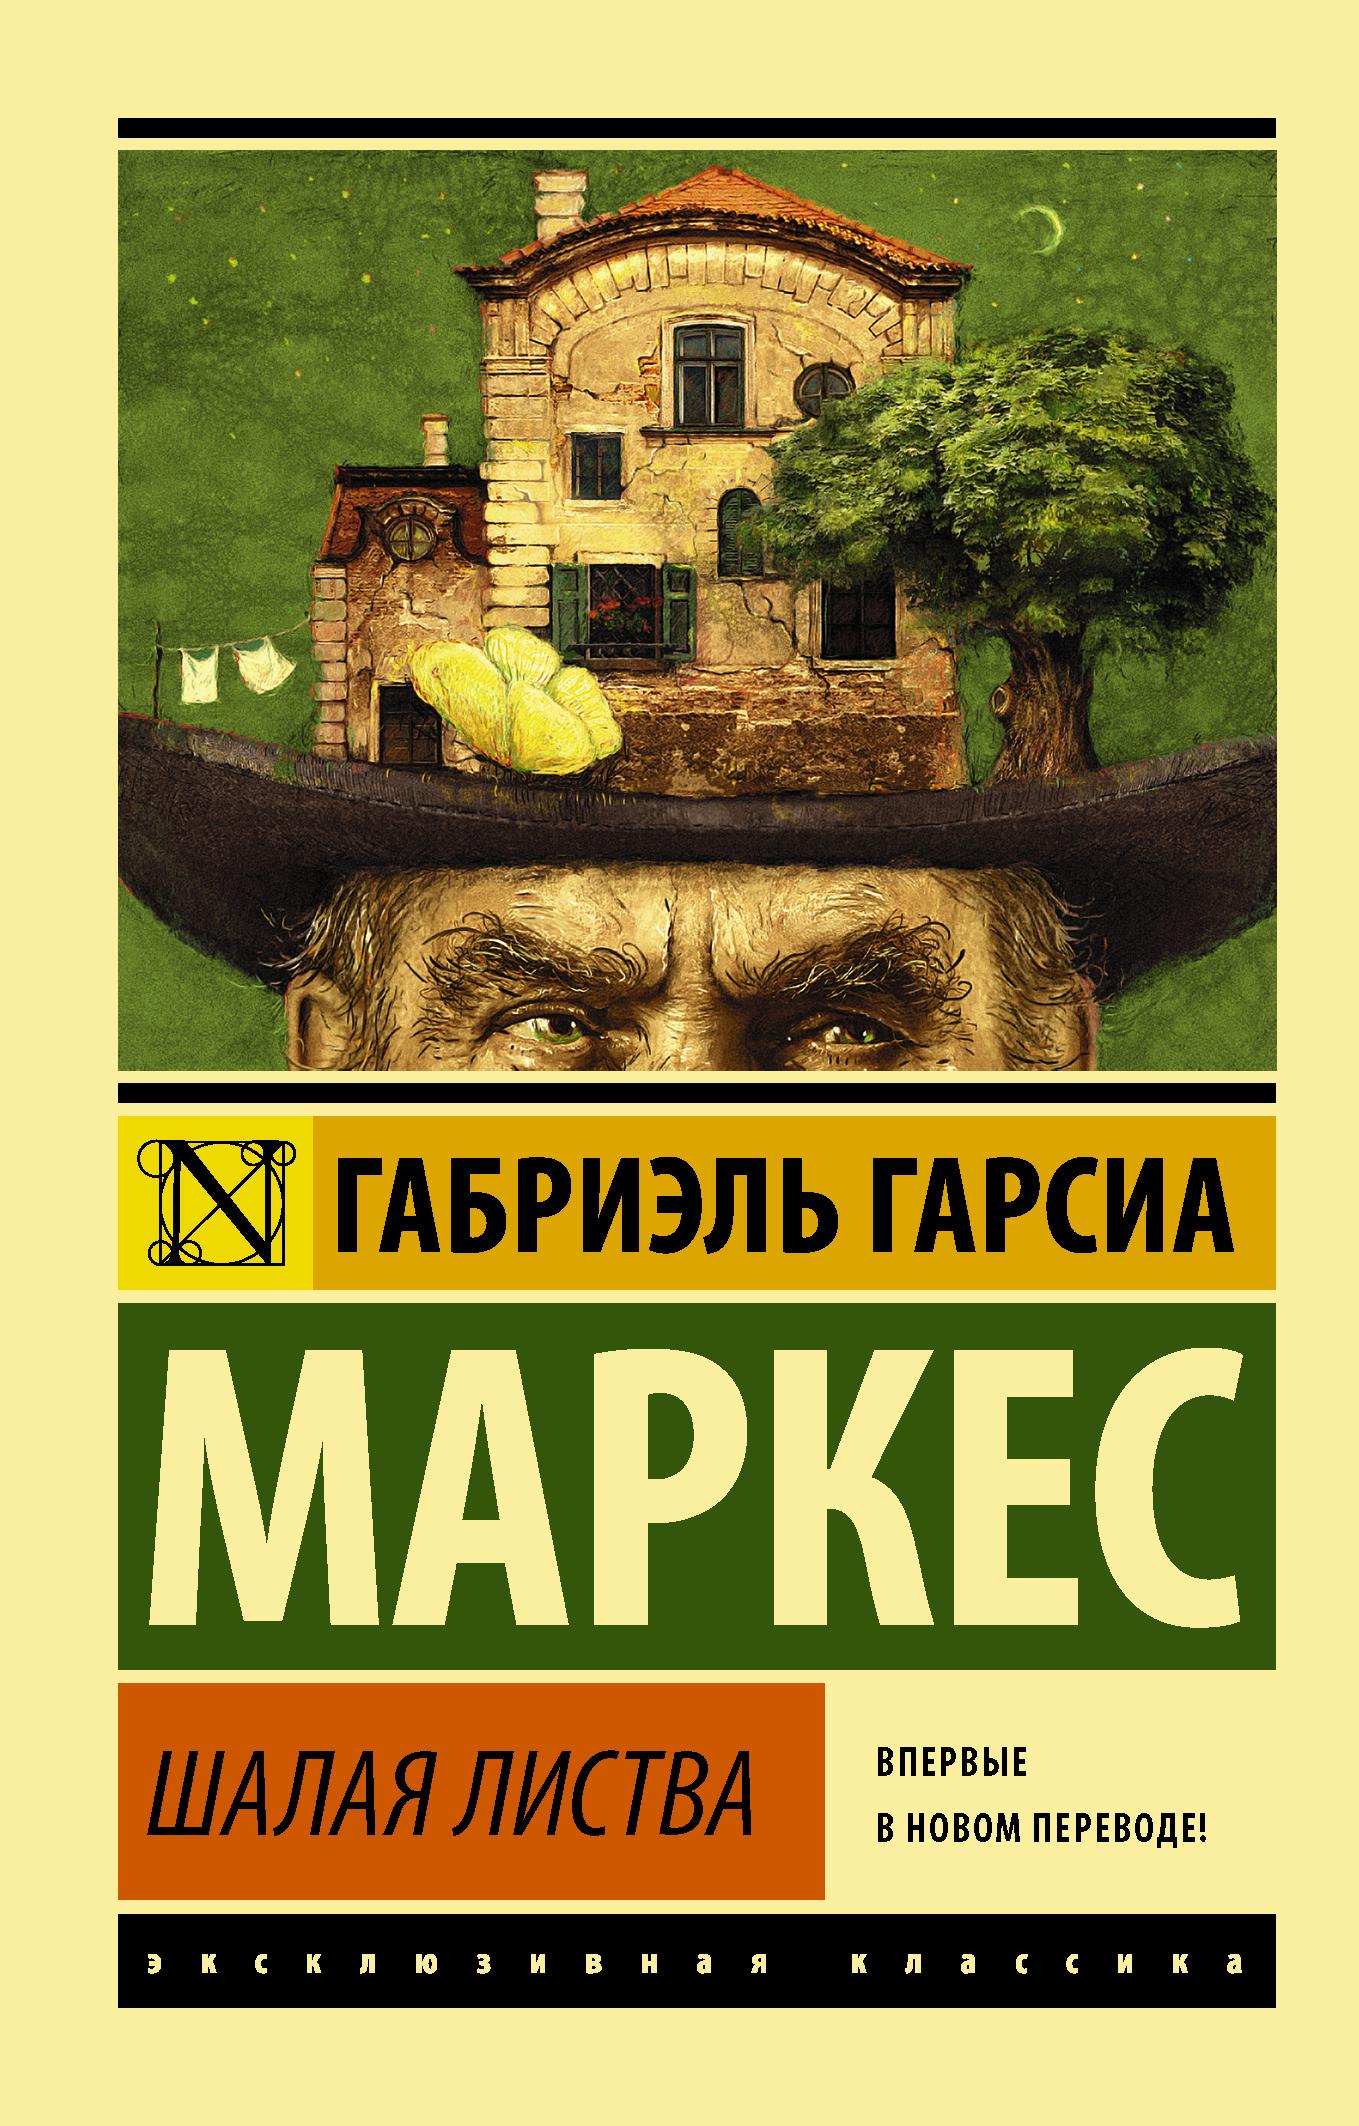 Габриэль Гарсиа Маркес Шалая листва габриэль гарсиа маркес полковнику никто не пишет isbn 978 5 271 34689 7